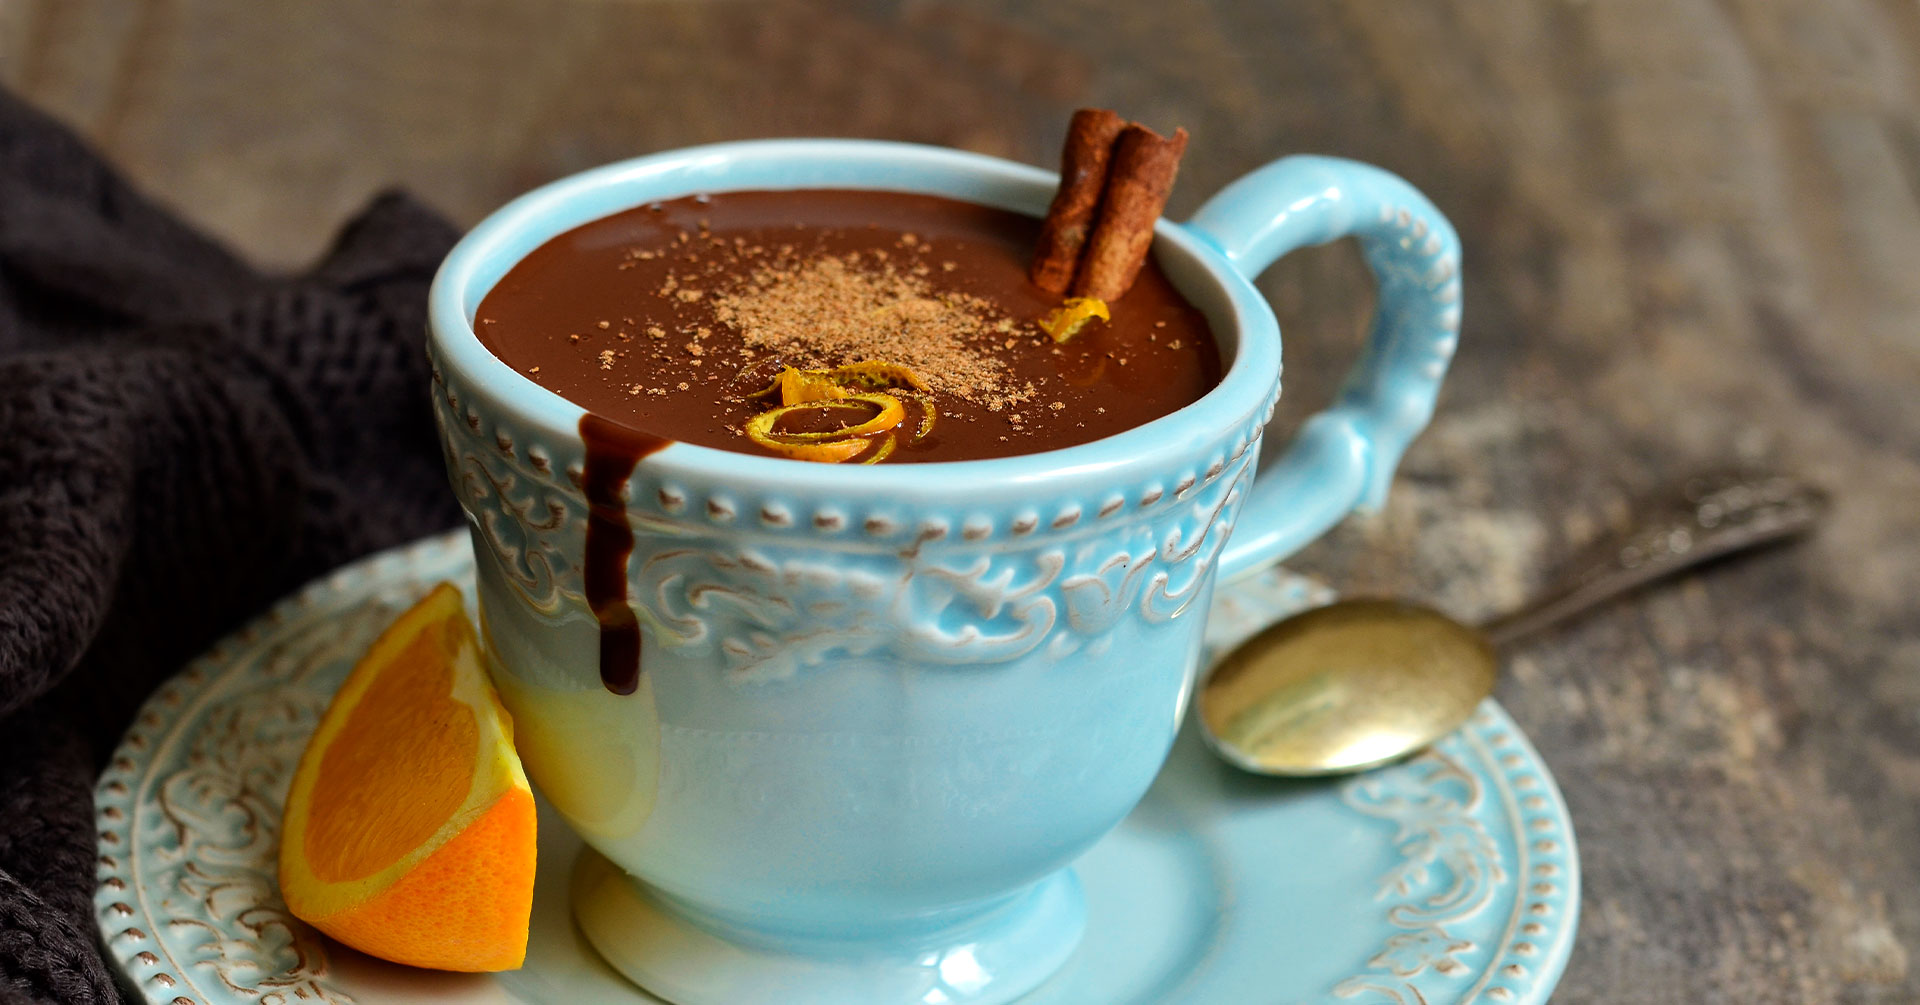 Exquisito chocolate caliente con naranja